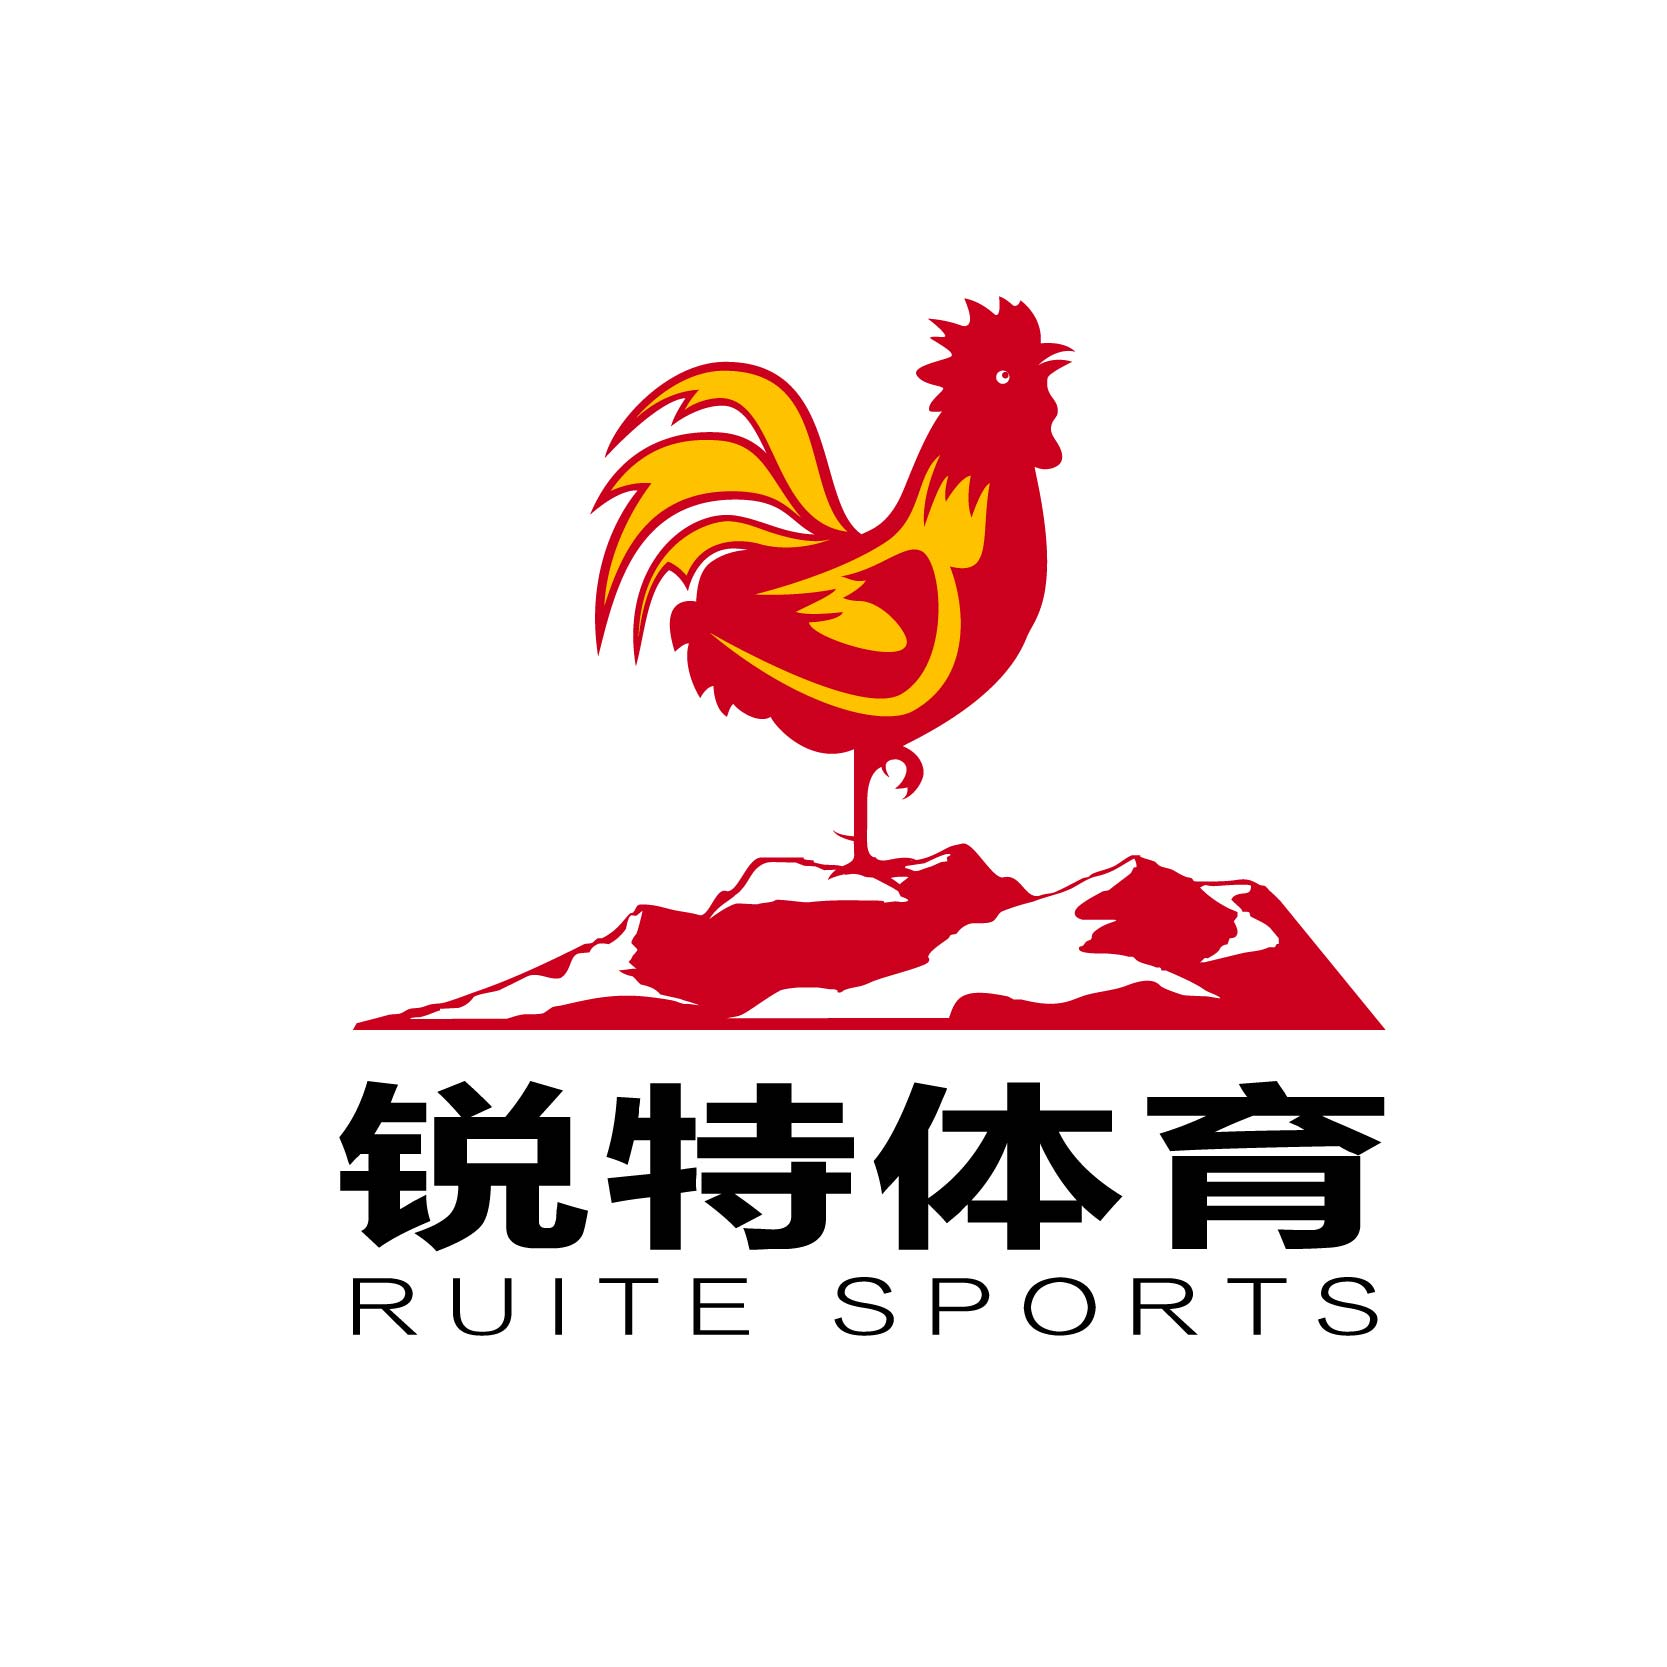 logo logo 标志 设计 图标 1667_1667